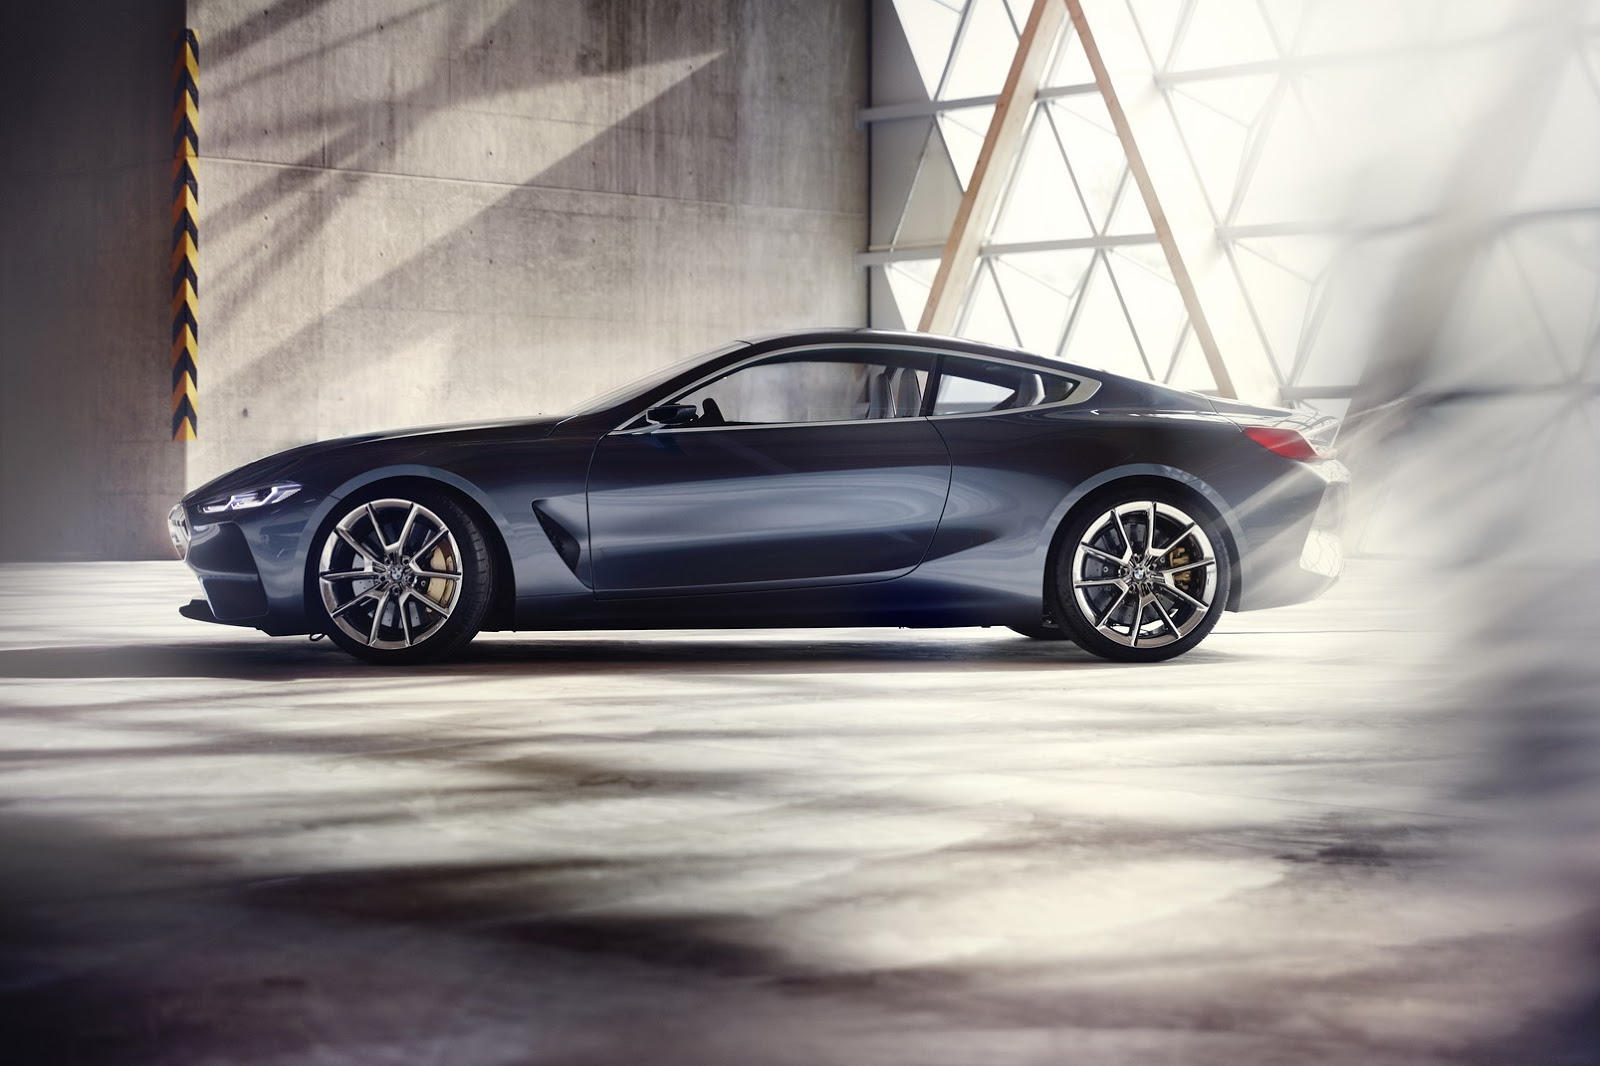 BMW_Concept_8_Series_11